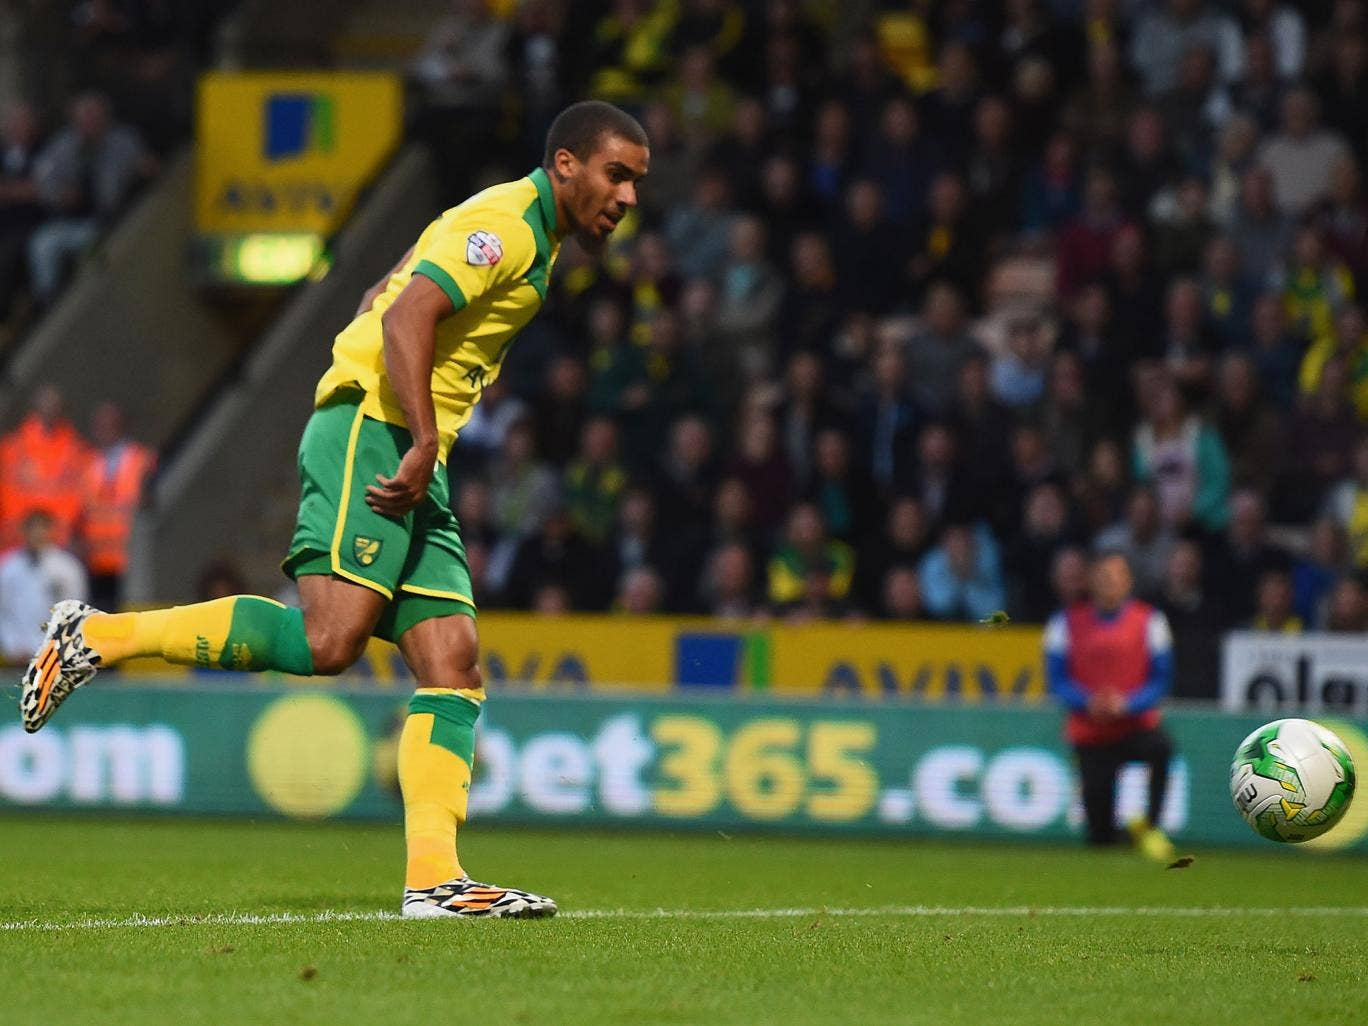 Lewis Grabban scored the winner as Norwich beat local rivals Ipswich Town